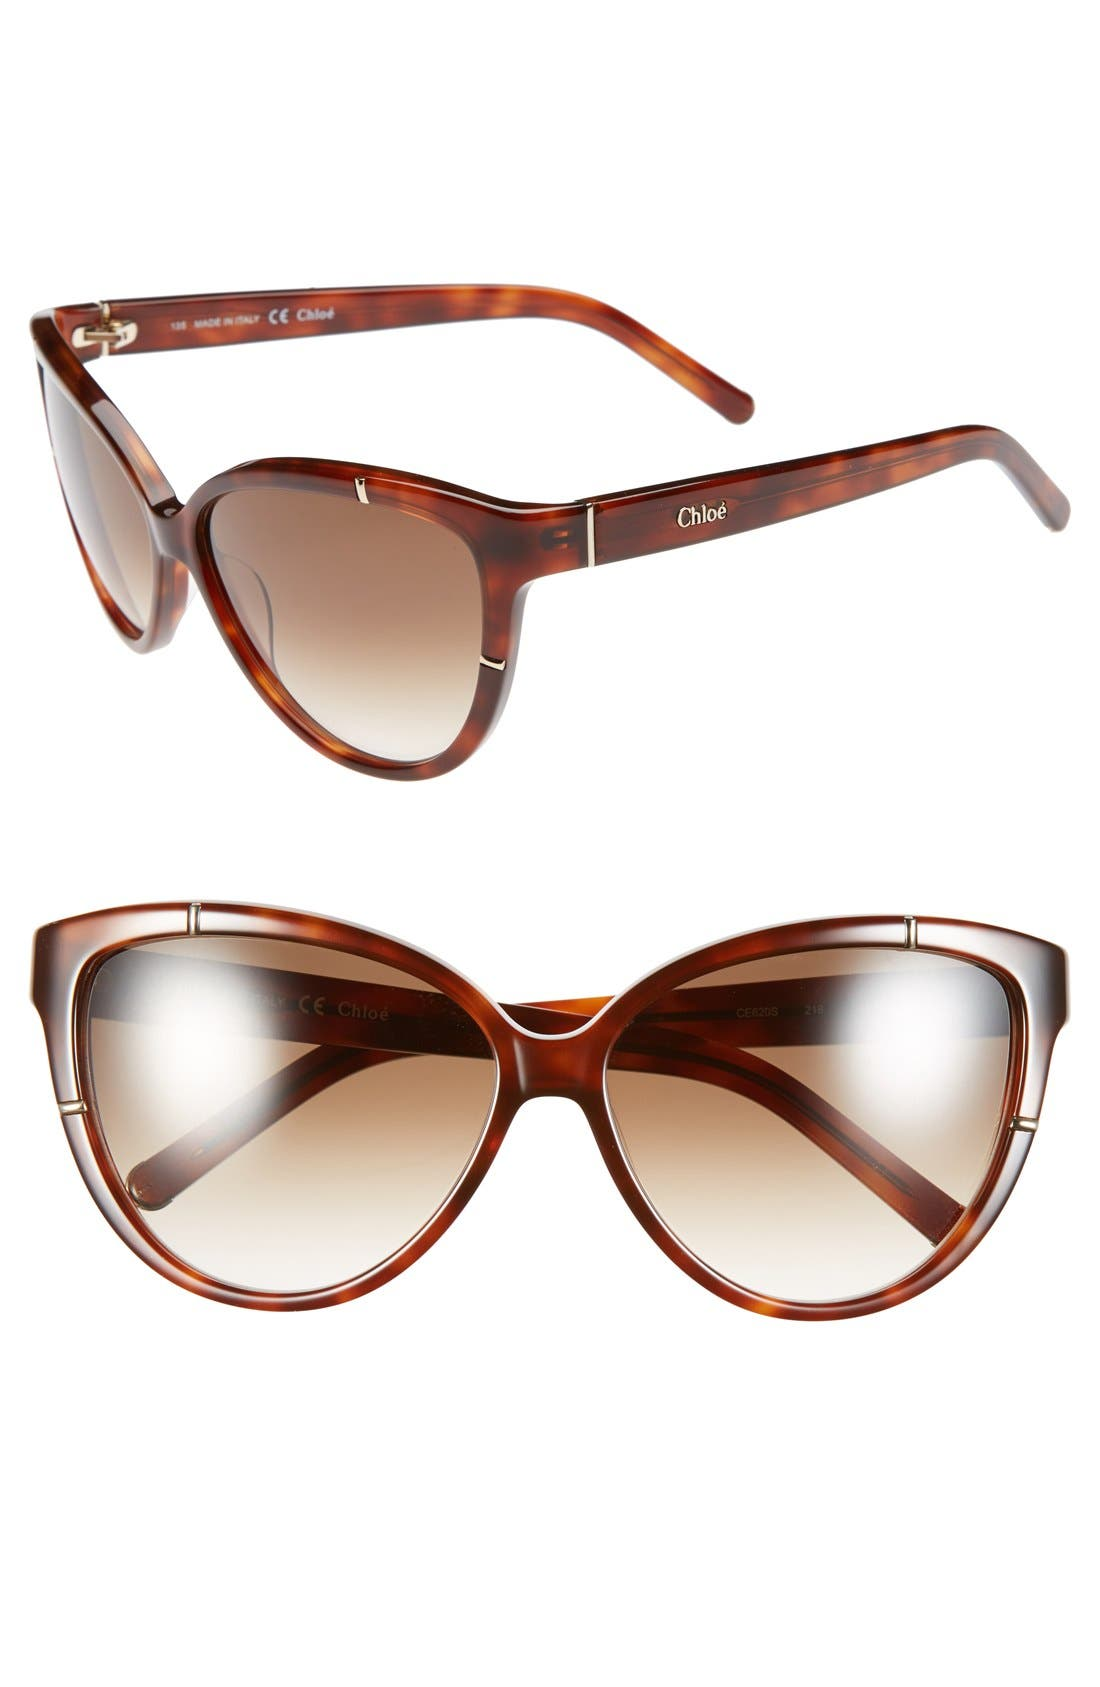 Main Image - Chloé 59mm Cat Eye Sunglasses